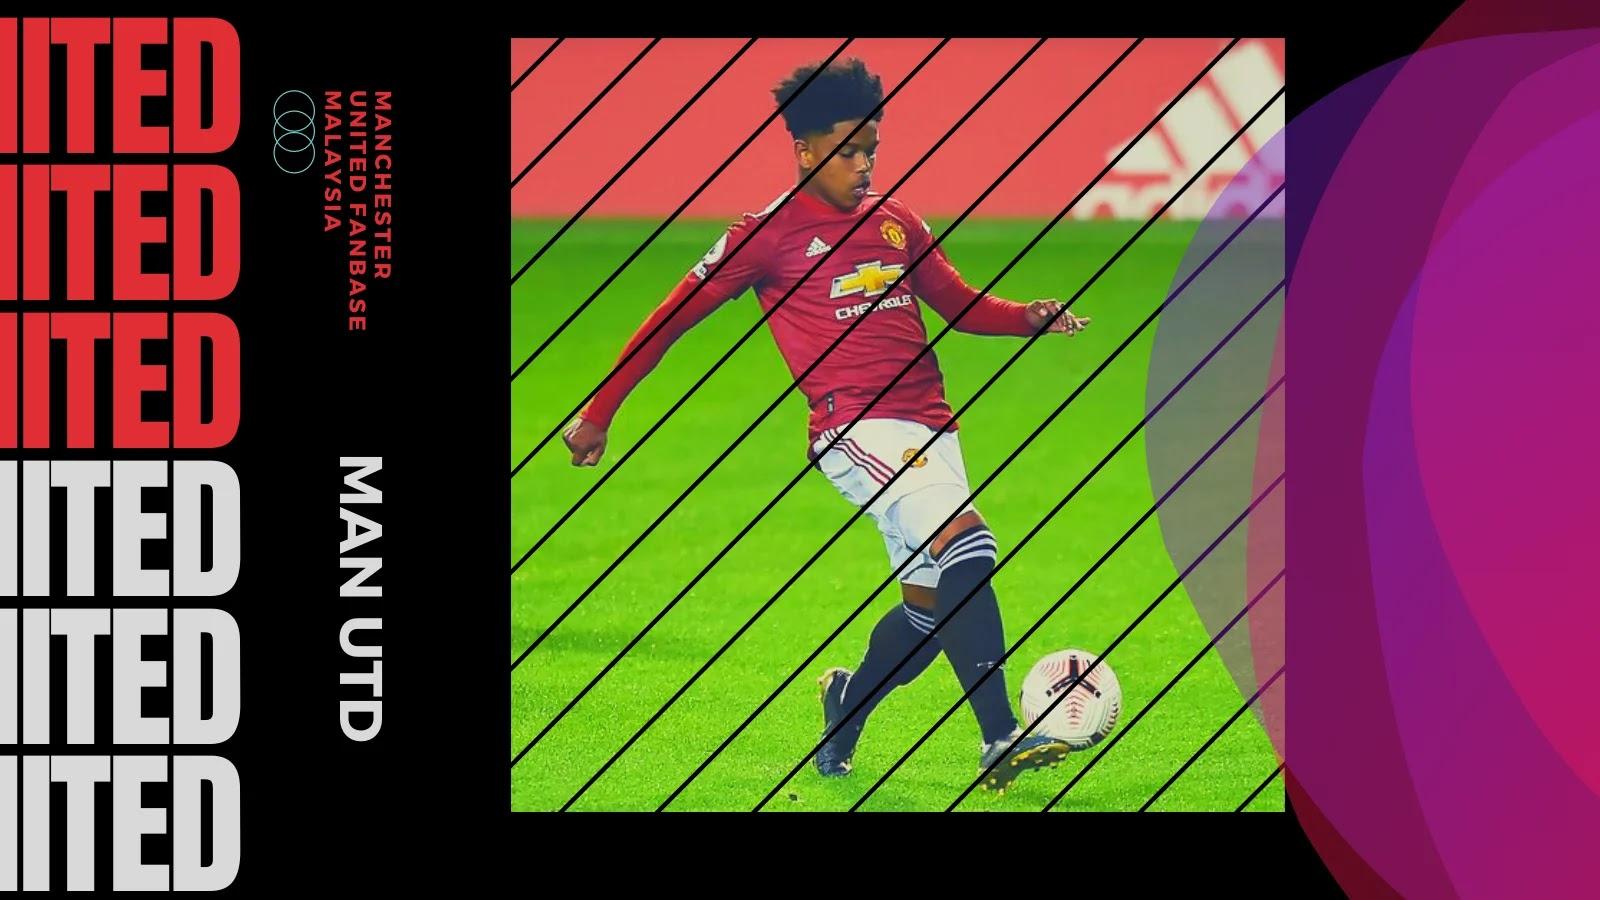 Shola Shoretire Membuat Jurulatih Manchester United Terkesima